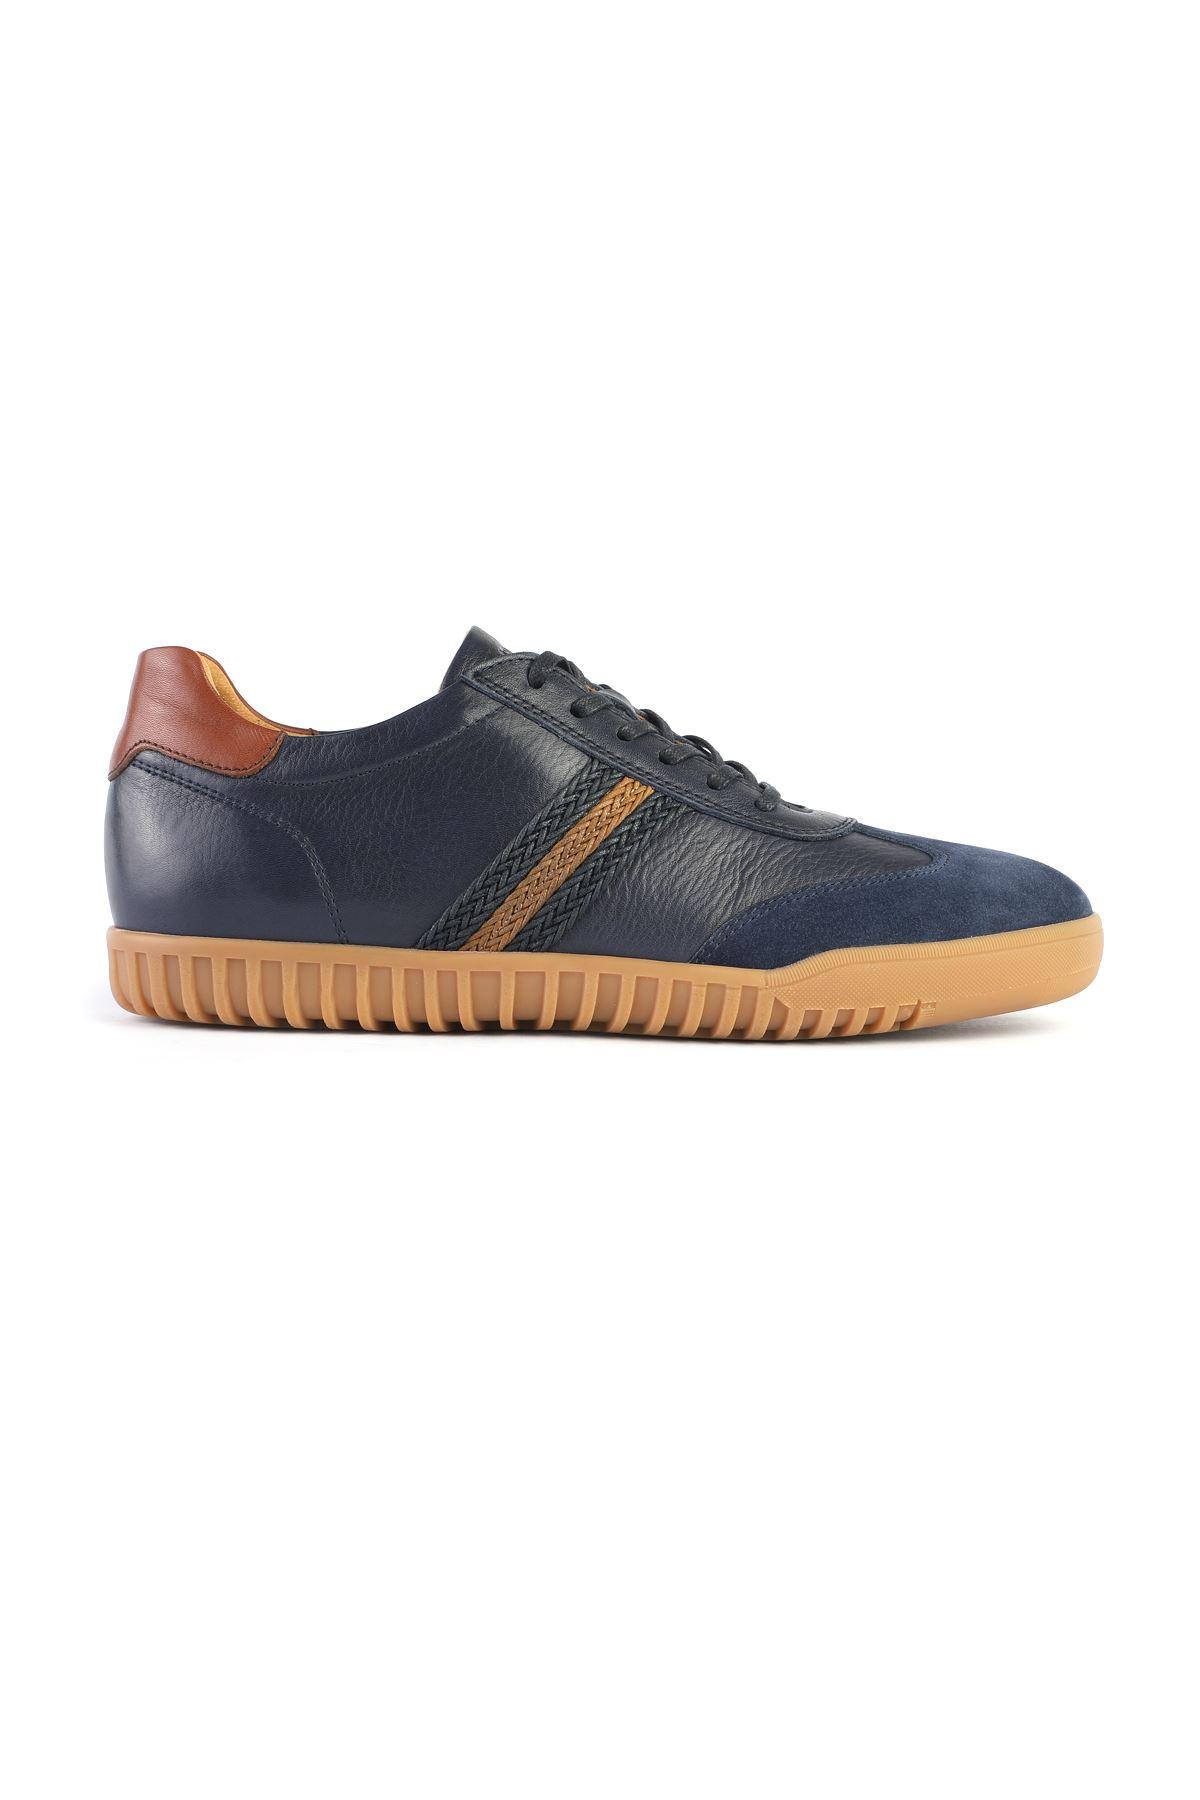 Libero 3422 Navy Blue Sport Shoes